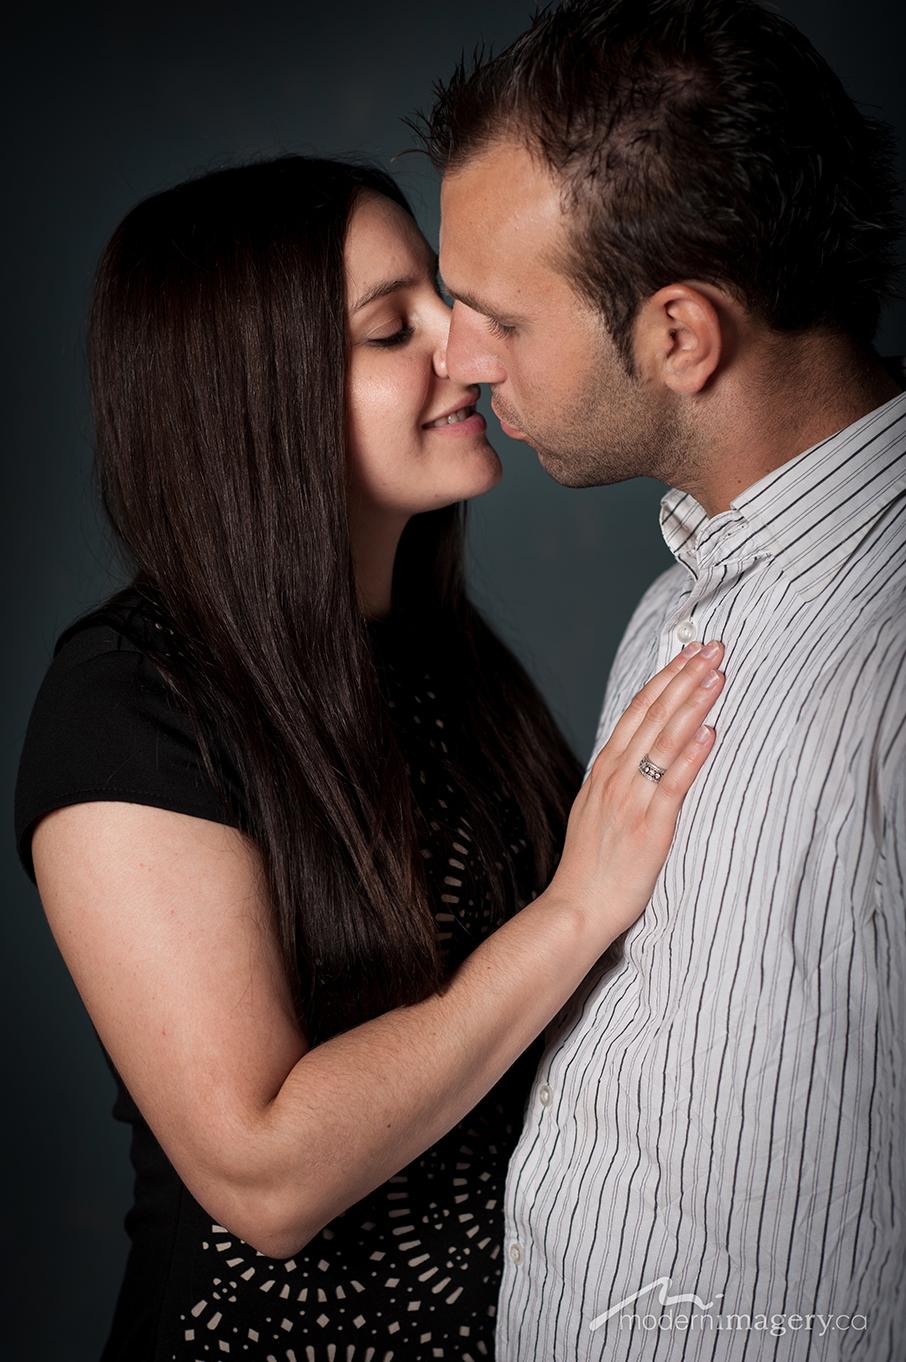 Rita&Tomasso-41.jpg